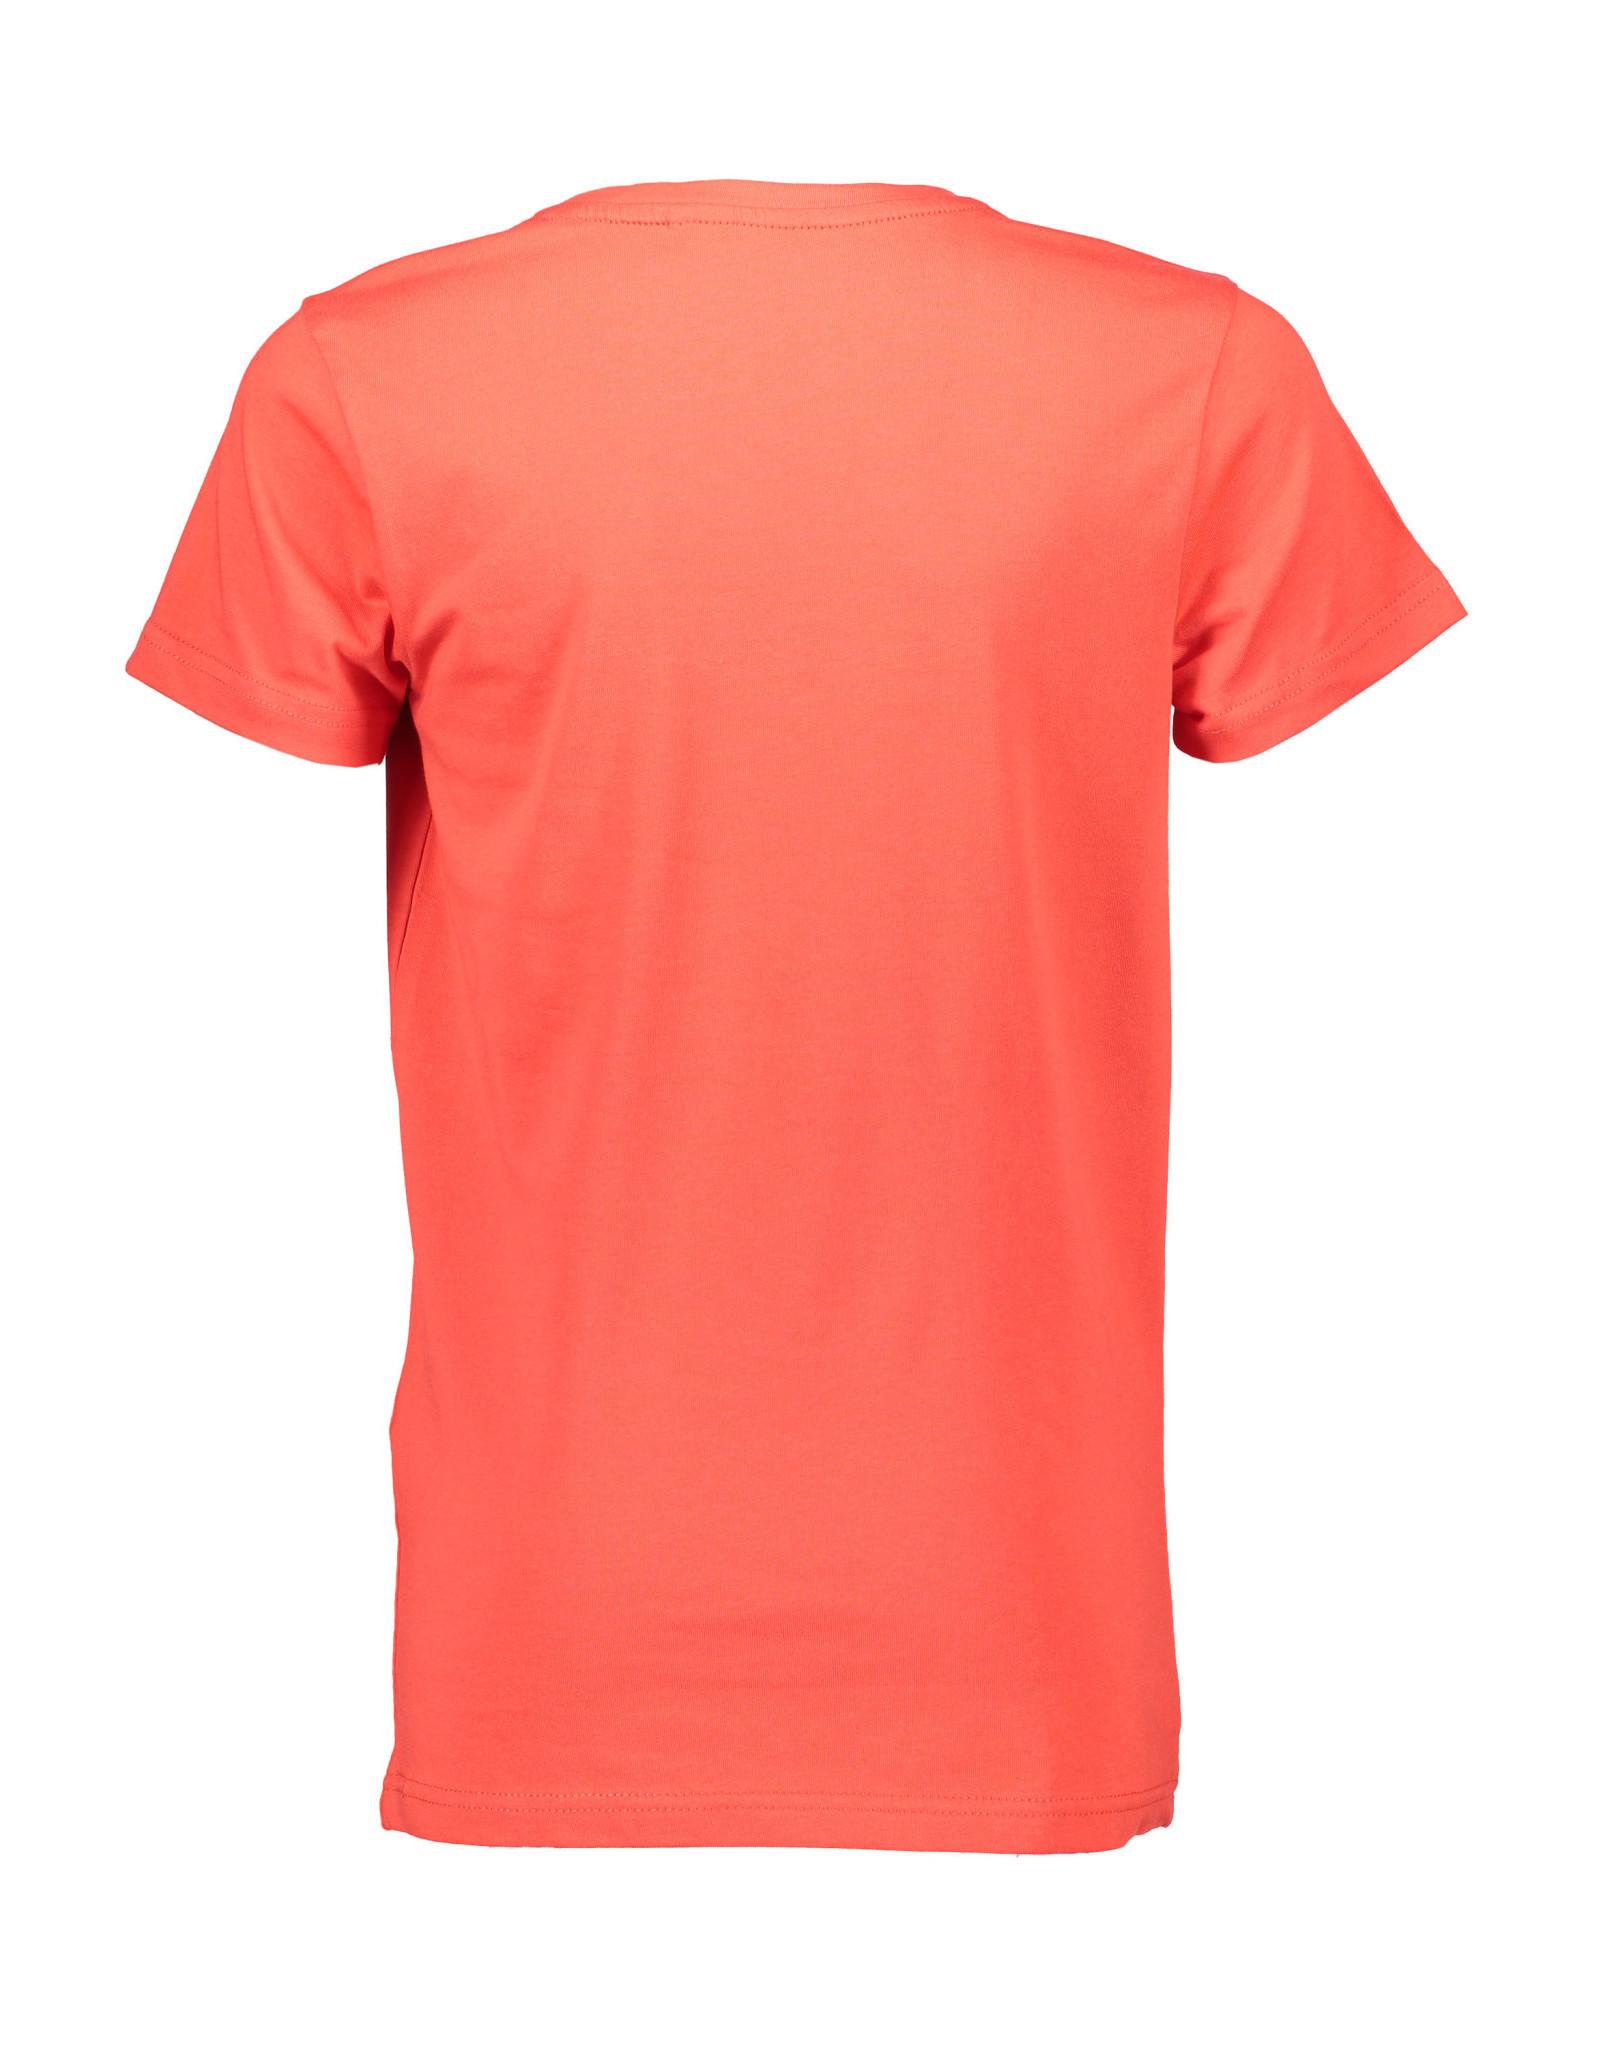 Bellaire Bellaire jongens t-shirt Kemy